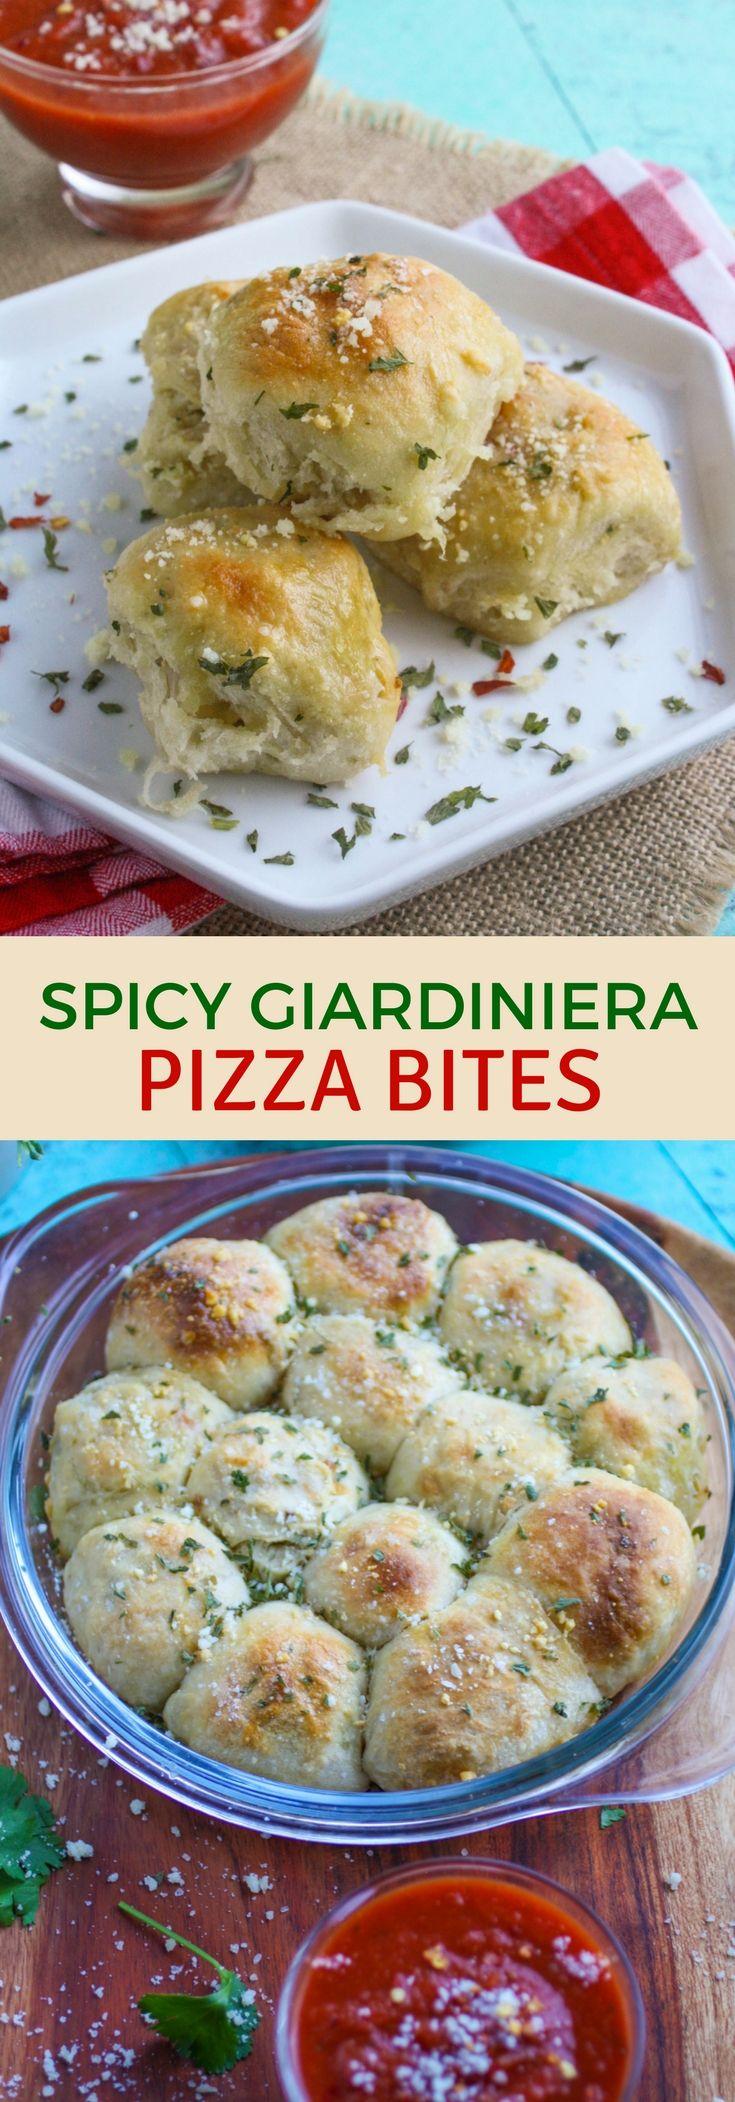 Spicy Giardiniera Pizza Bites